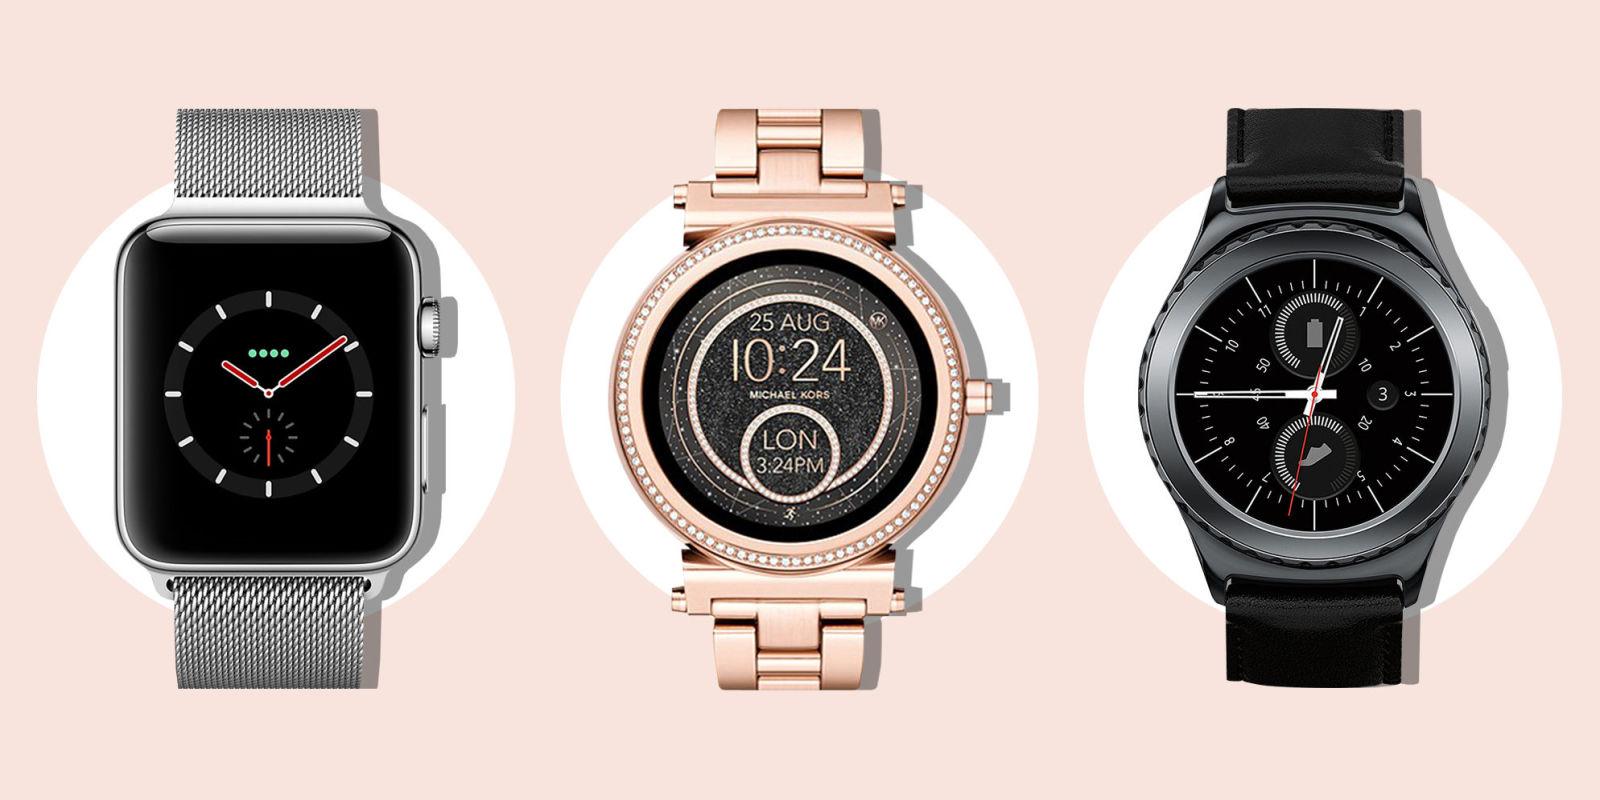 15 Best Smartwatches of 2017